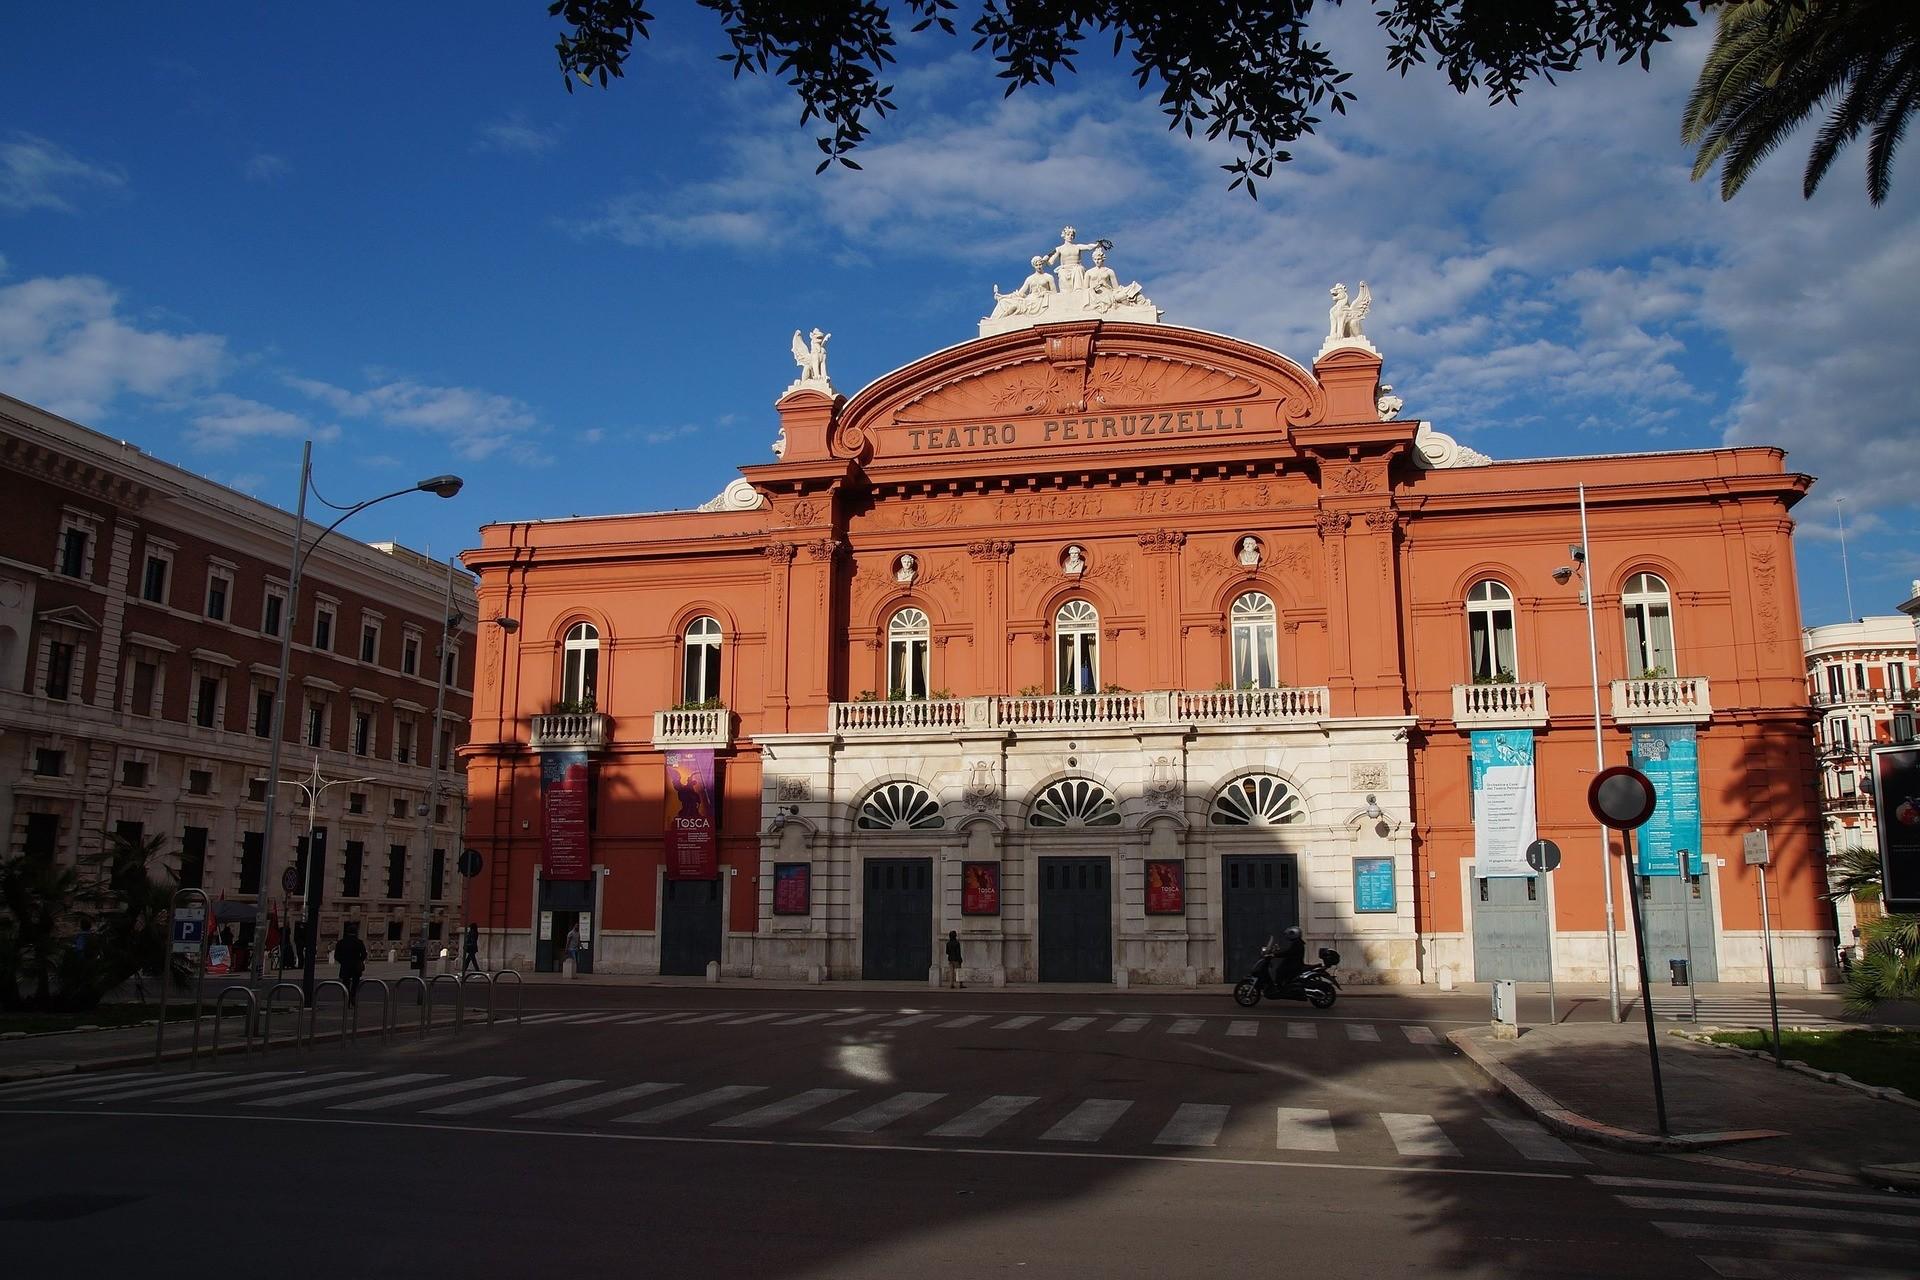 Teatro Petruzzelli a Bari - Foto di tomek999